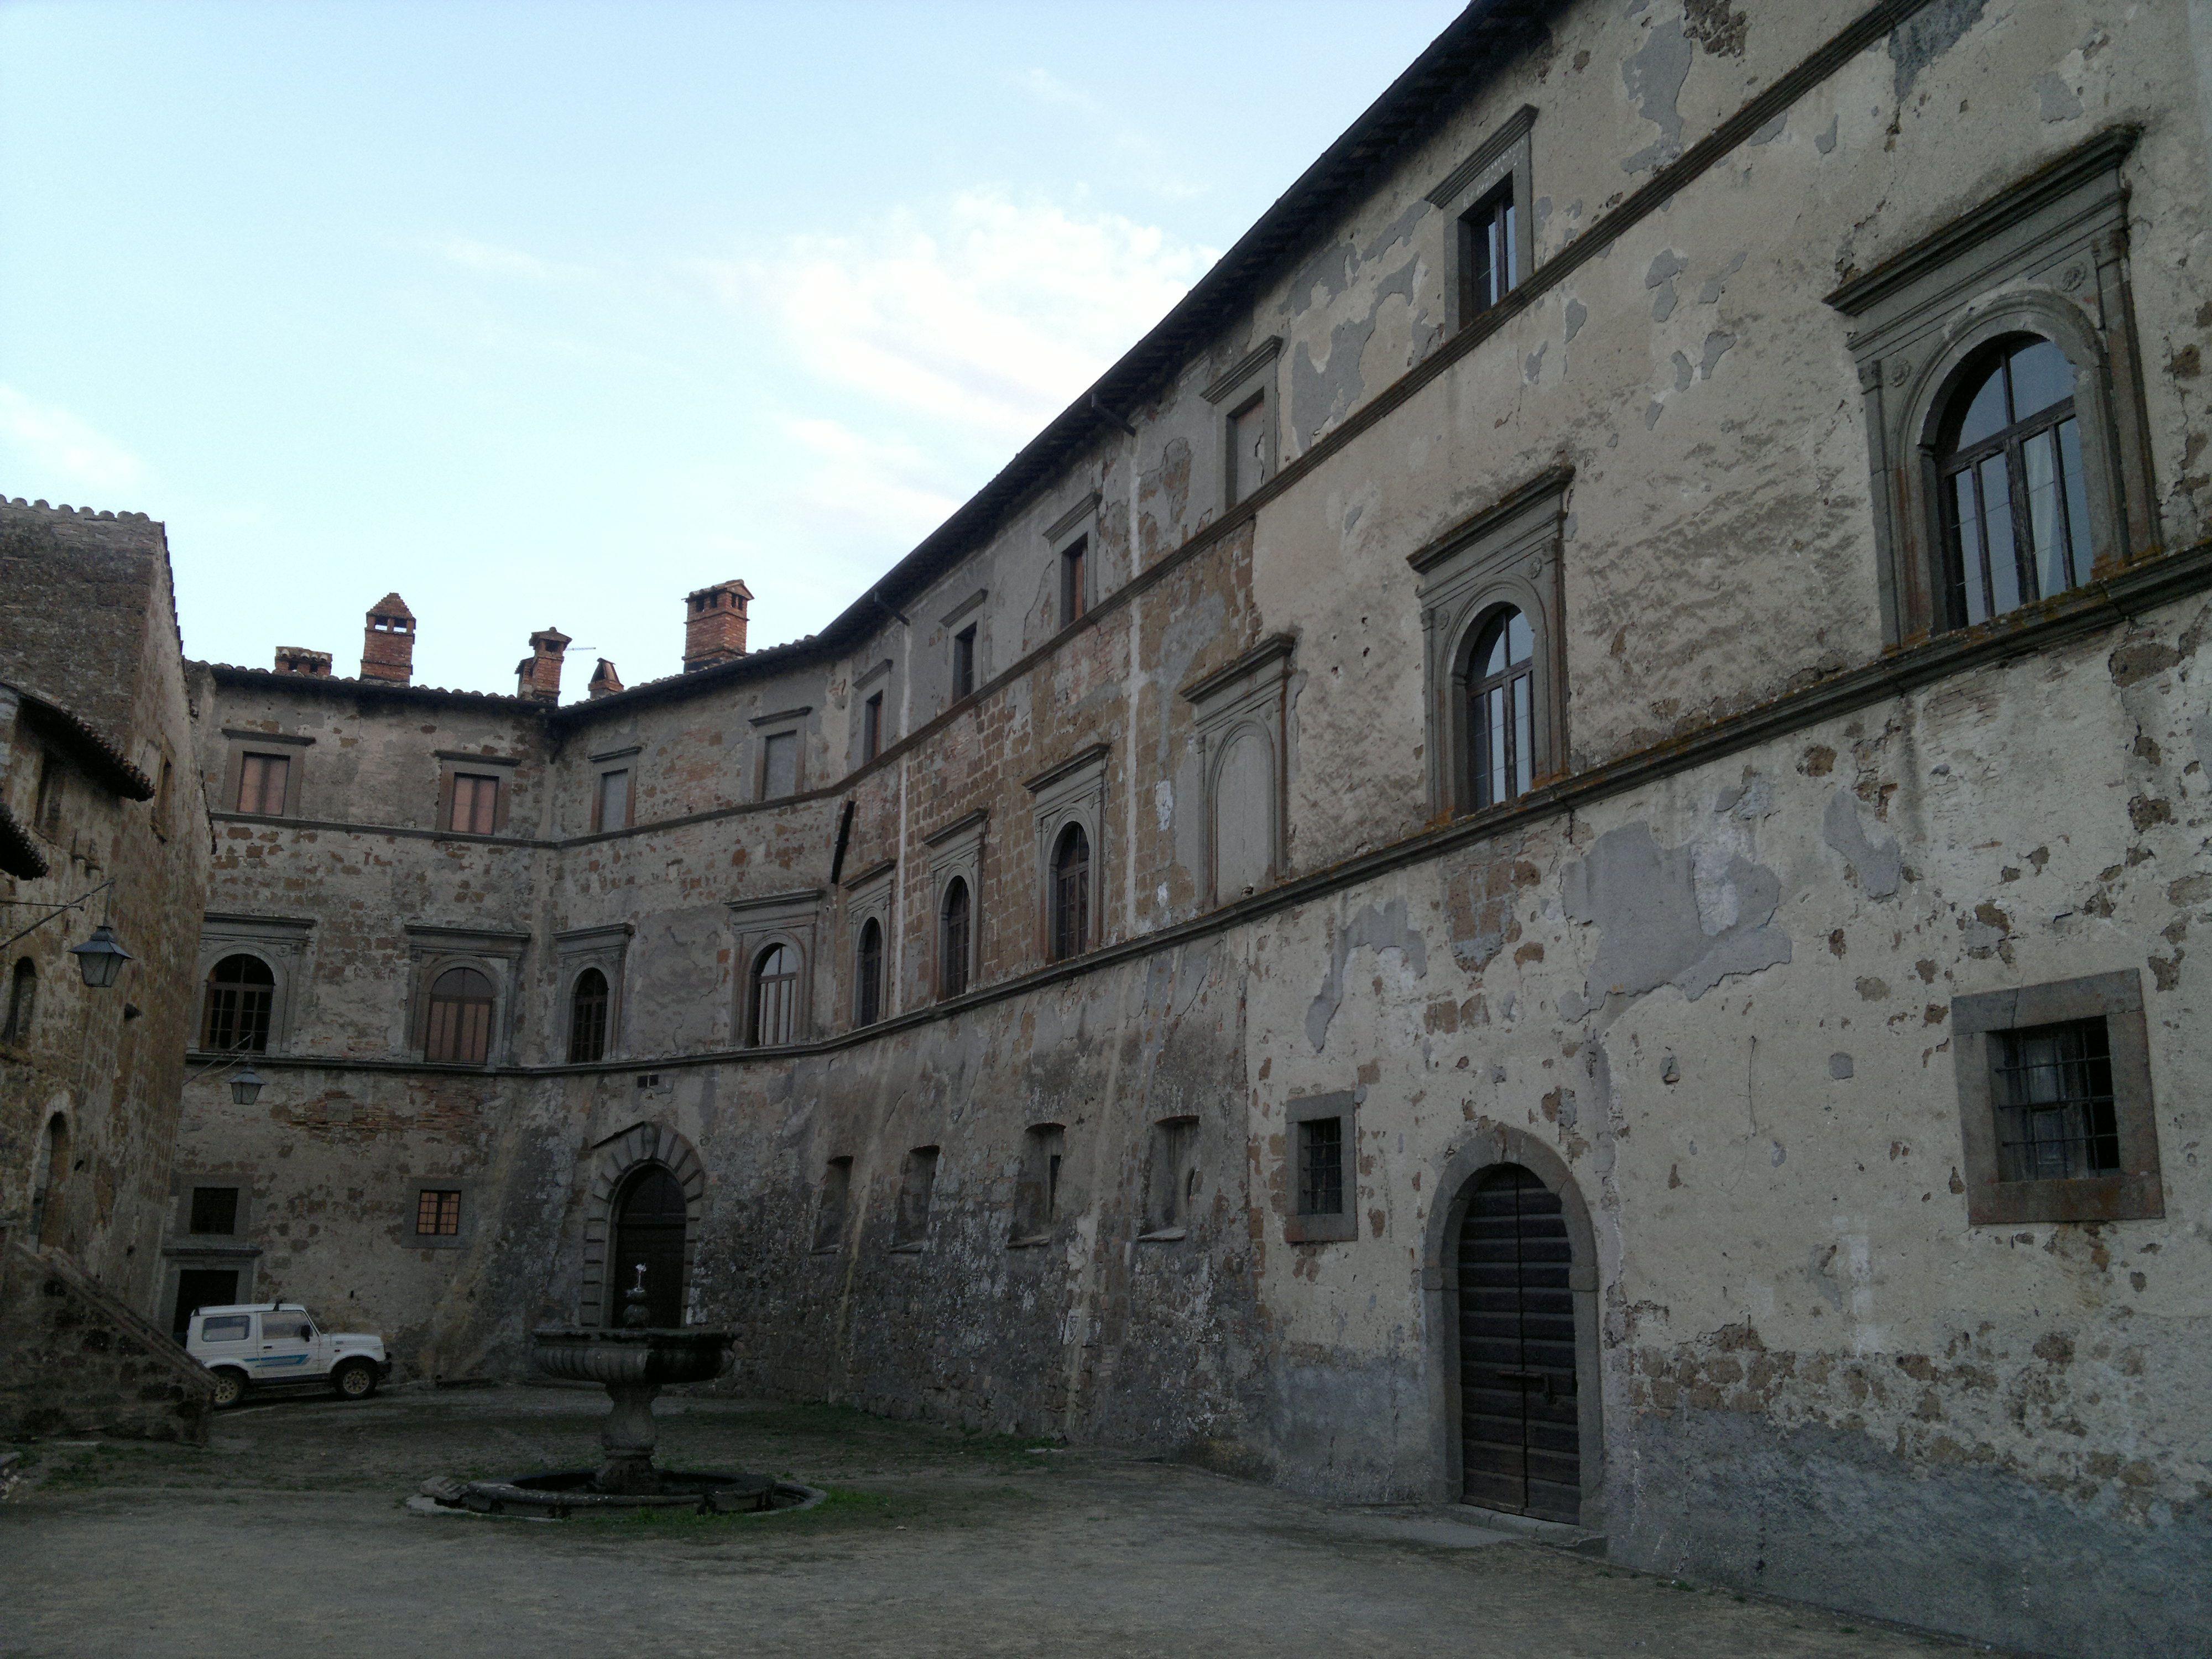 Montecalvello (Viterbo)